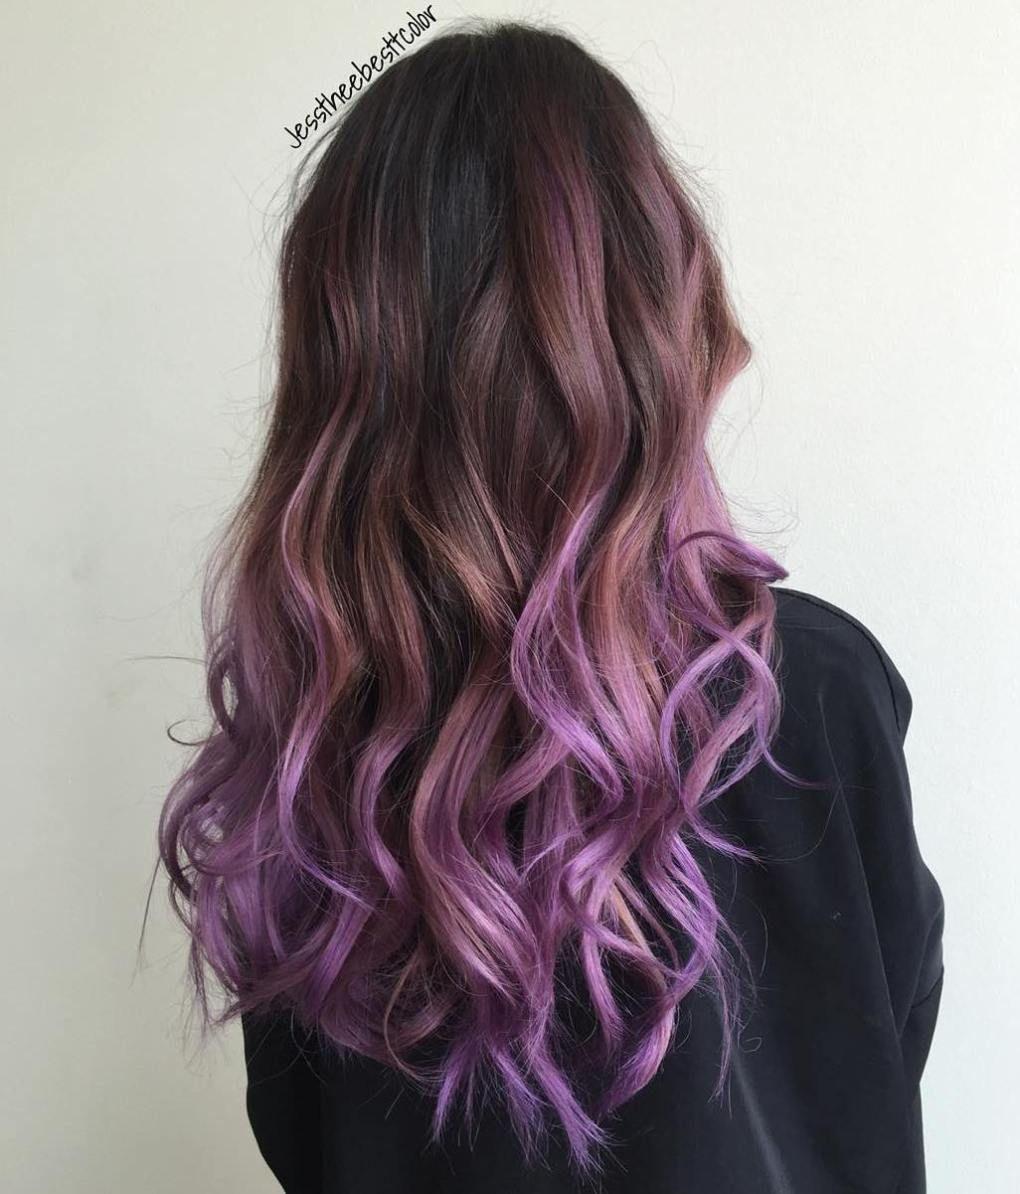 The Prettiest Pastel Purple Hair Ideas Dyed Ends Of Hair Purple Ombre Hair Pretty Hair Color